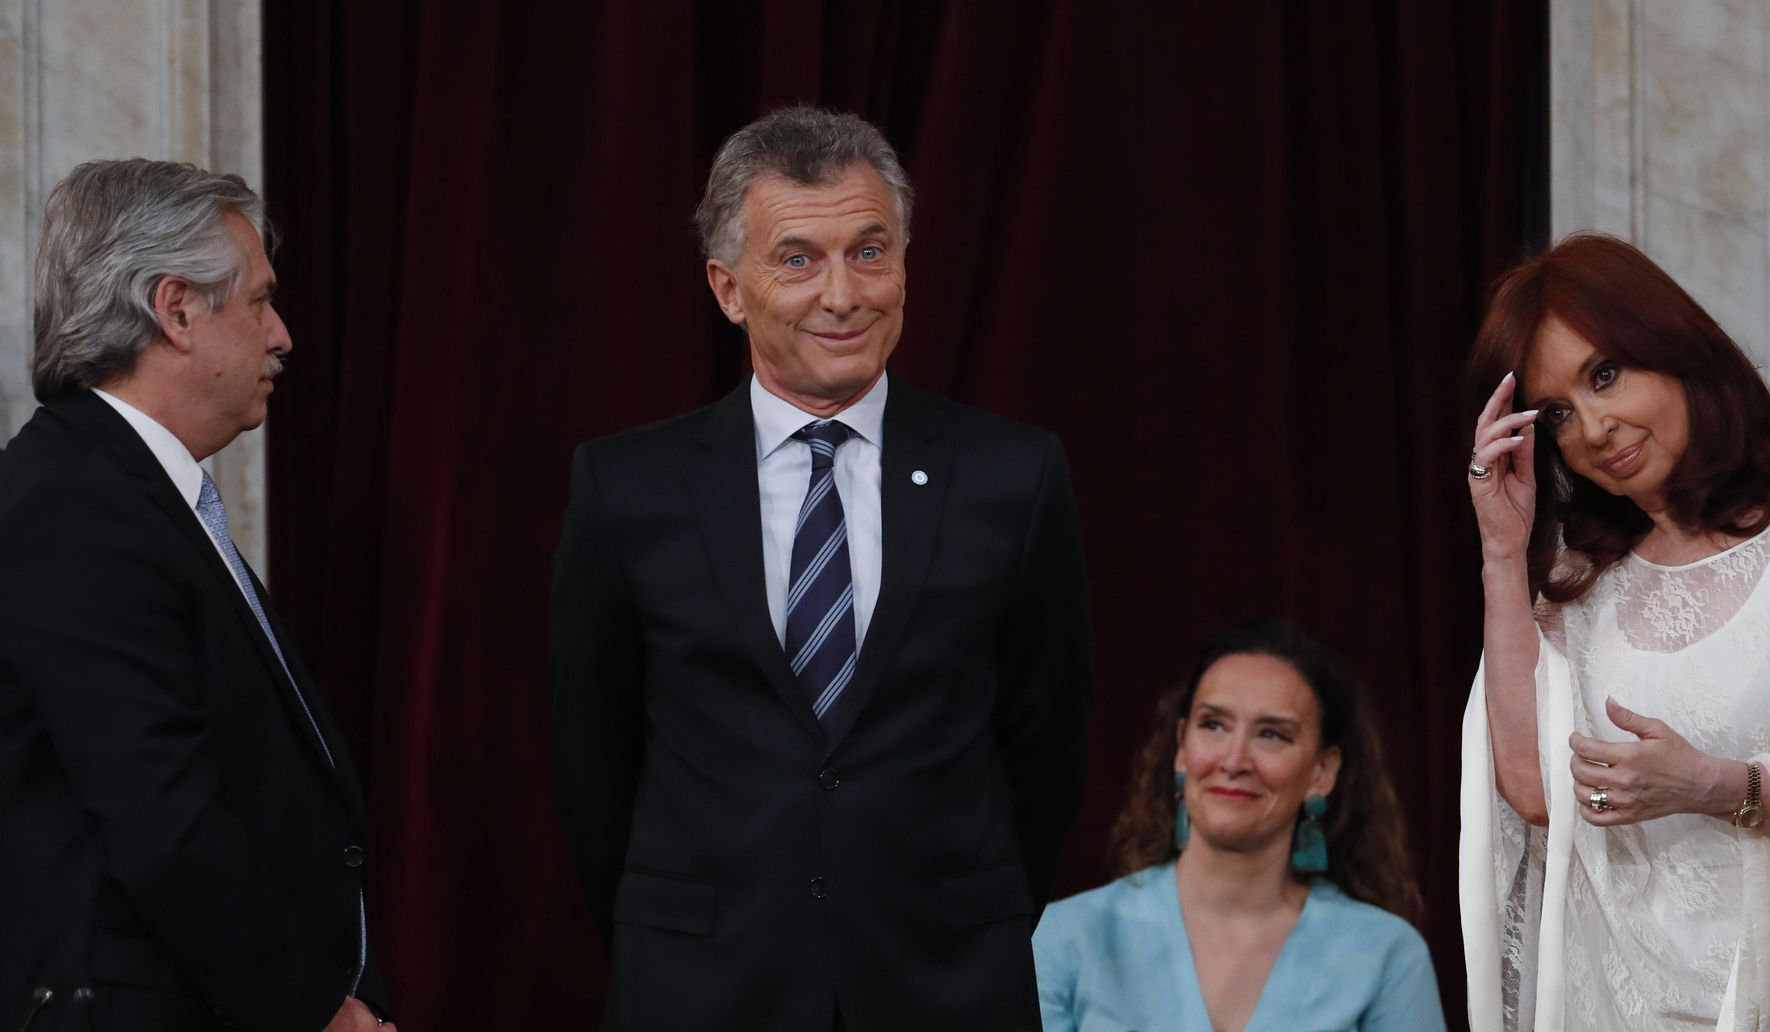 Aptopix_argentina_presidential_inauguration_70783_c0-176-4198-2623_s1770x1032